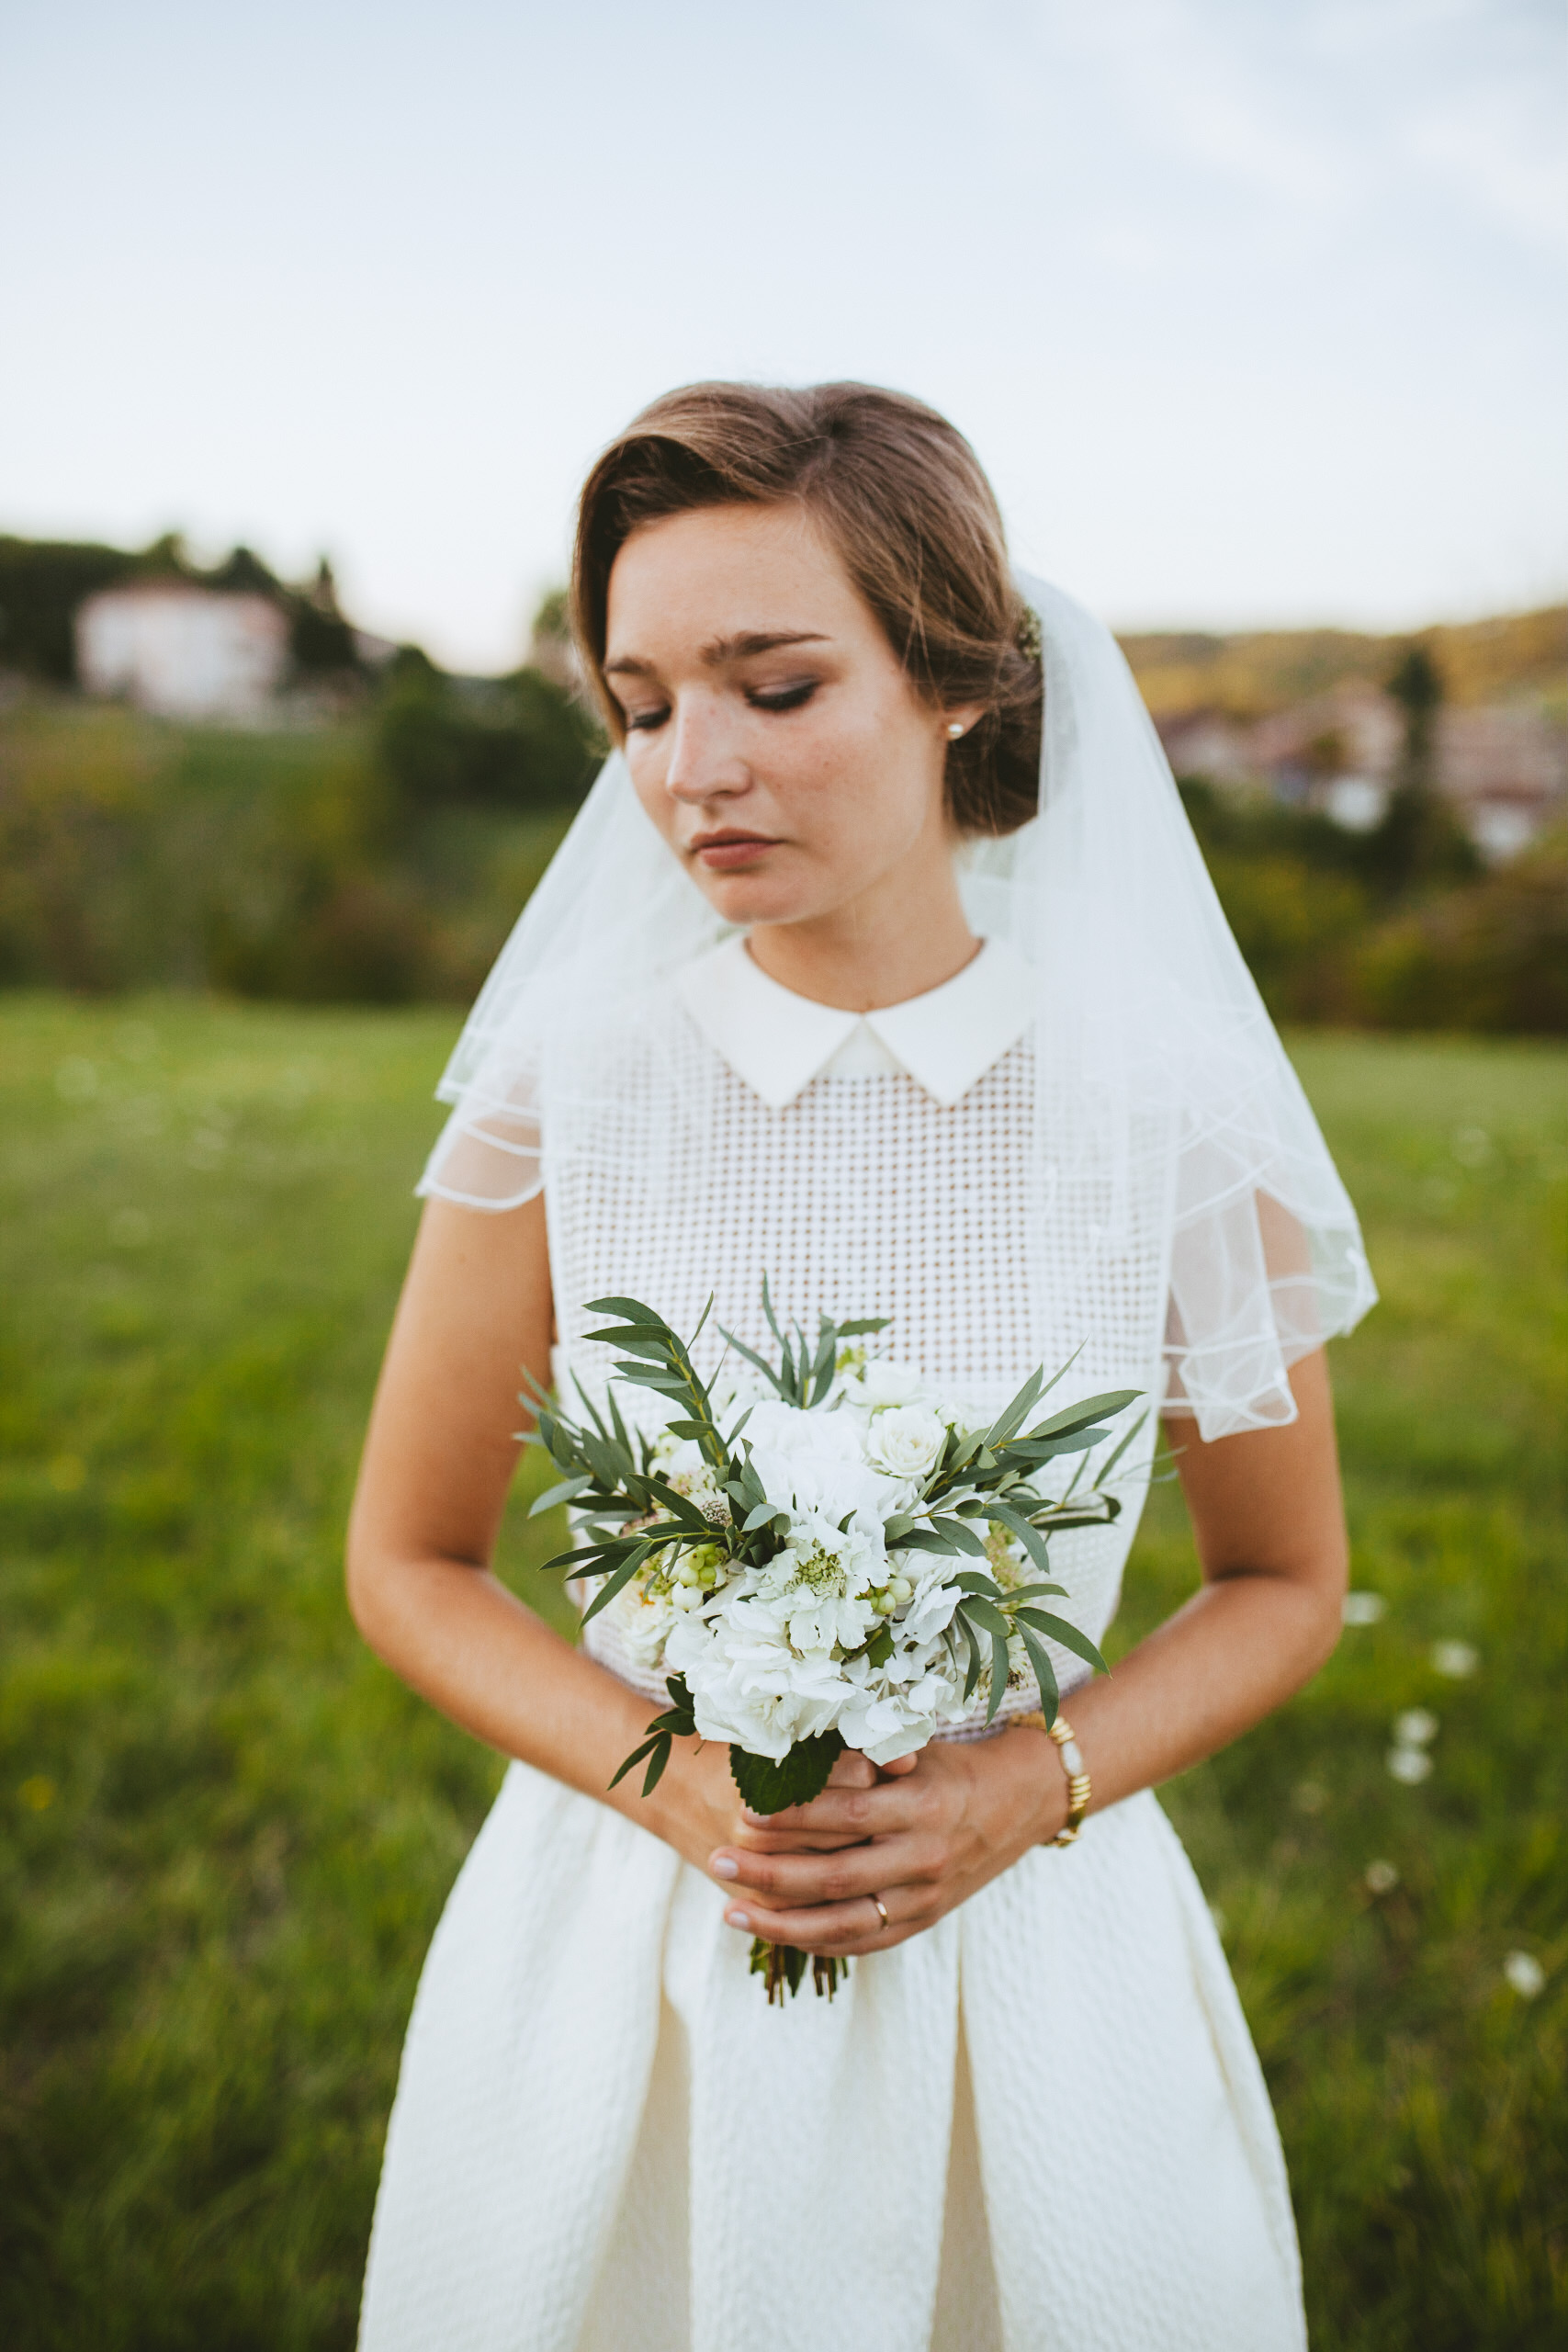 Ruban Collectif, Fleuriste mariage Landes et Pays Basque, fleuriste mariage hossegor, fleuriste mariage biarritz, fleuriste originale, fleuriste poetique